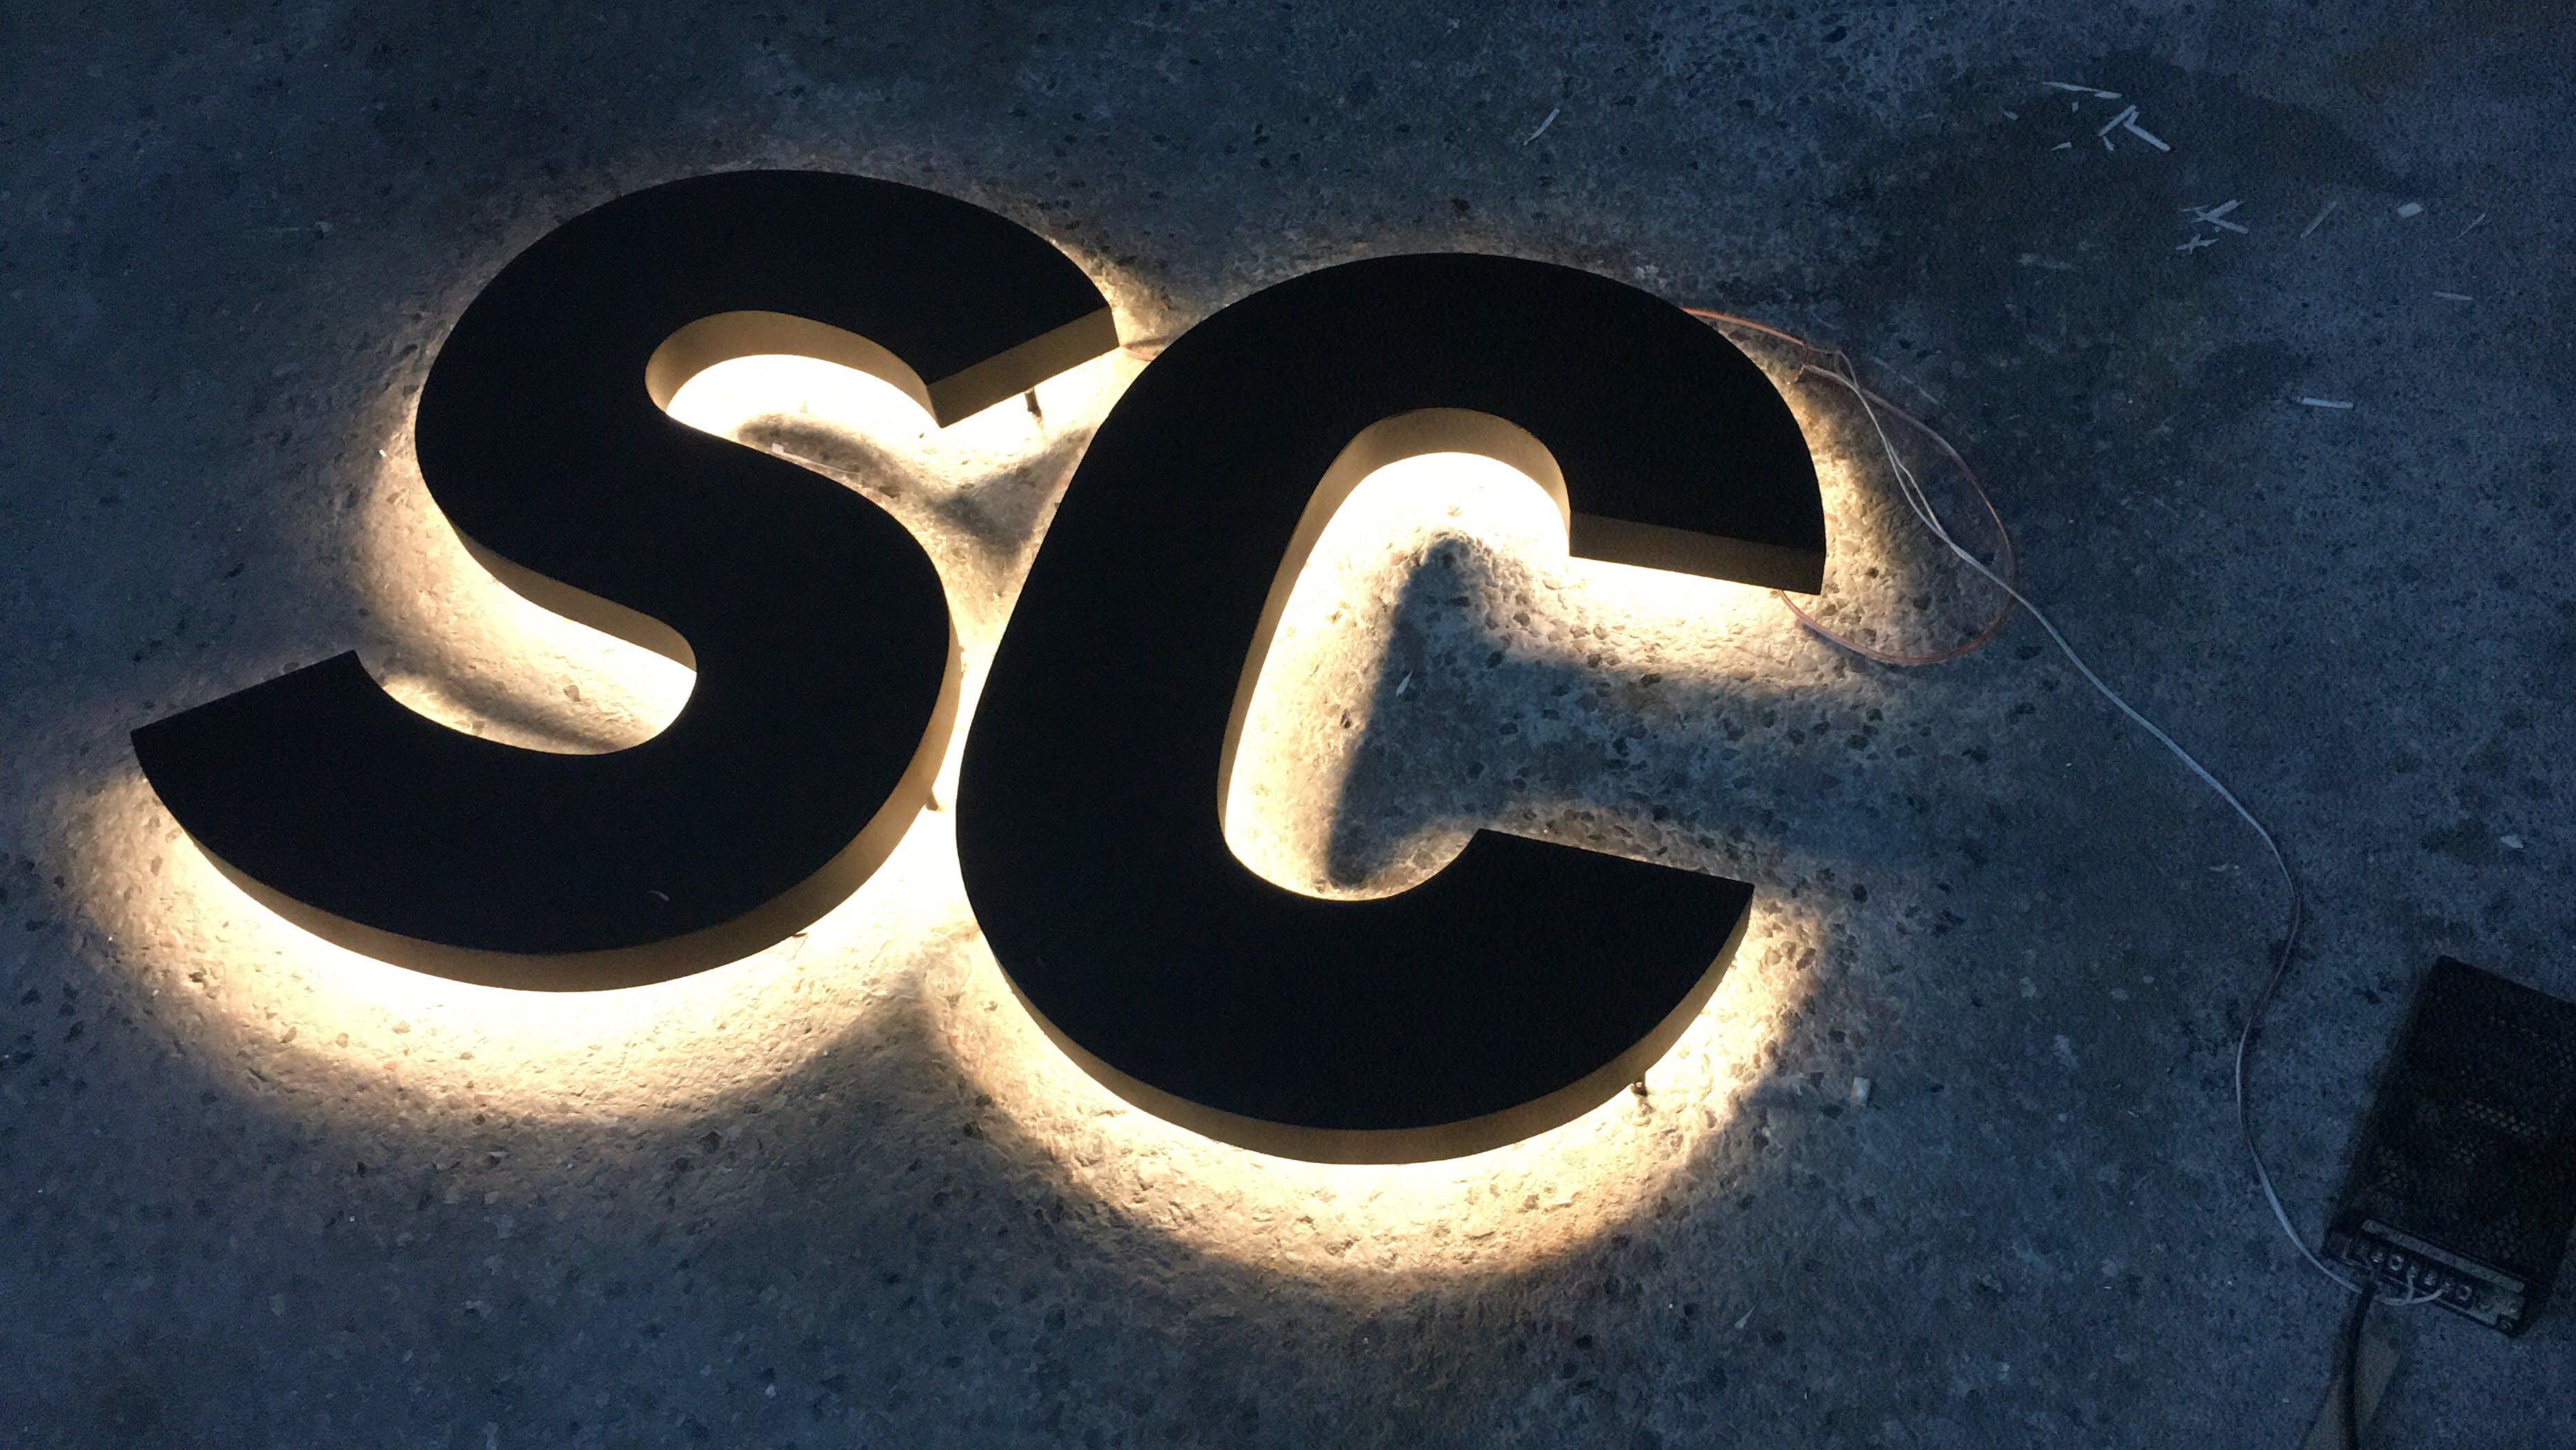 Black SC Cutout Lighted Decor